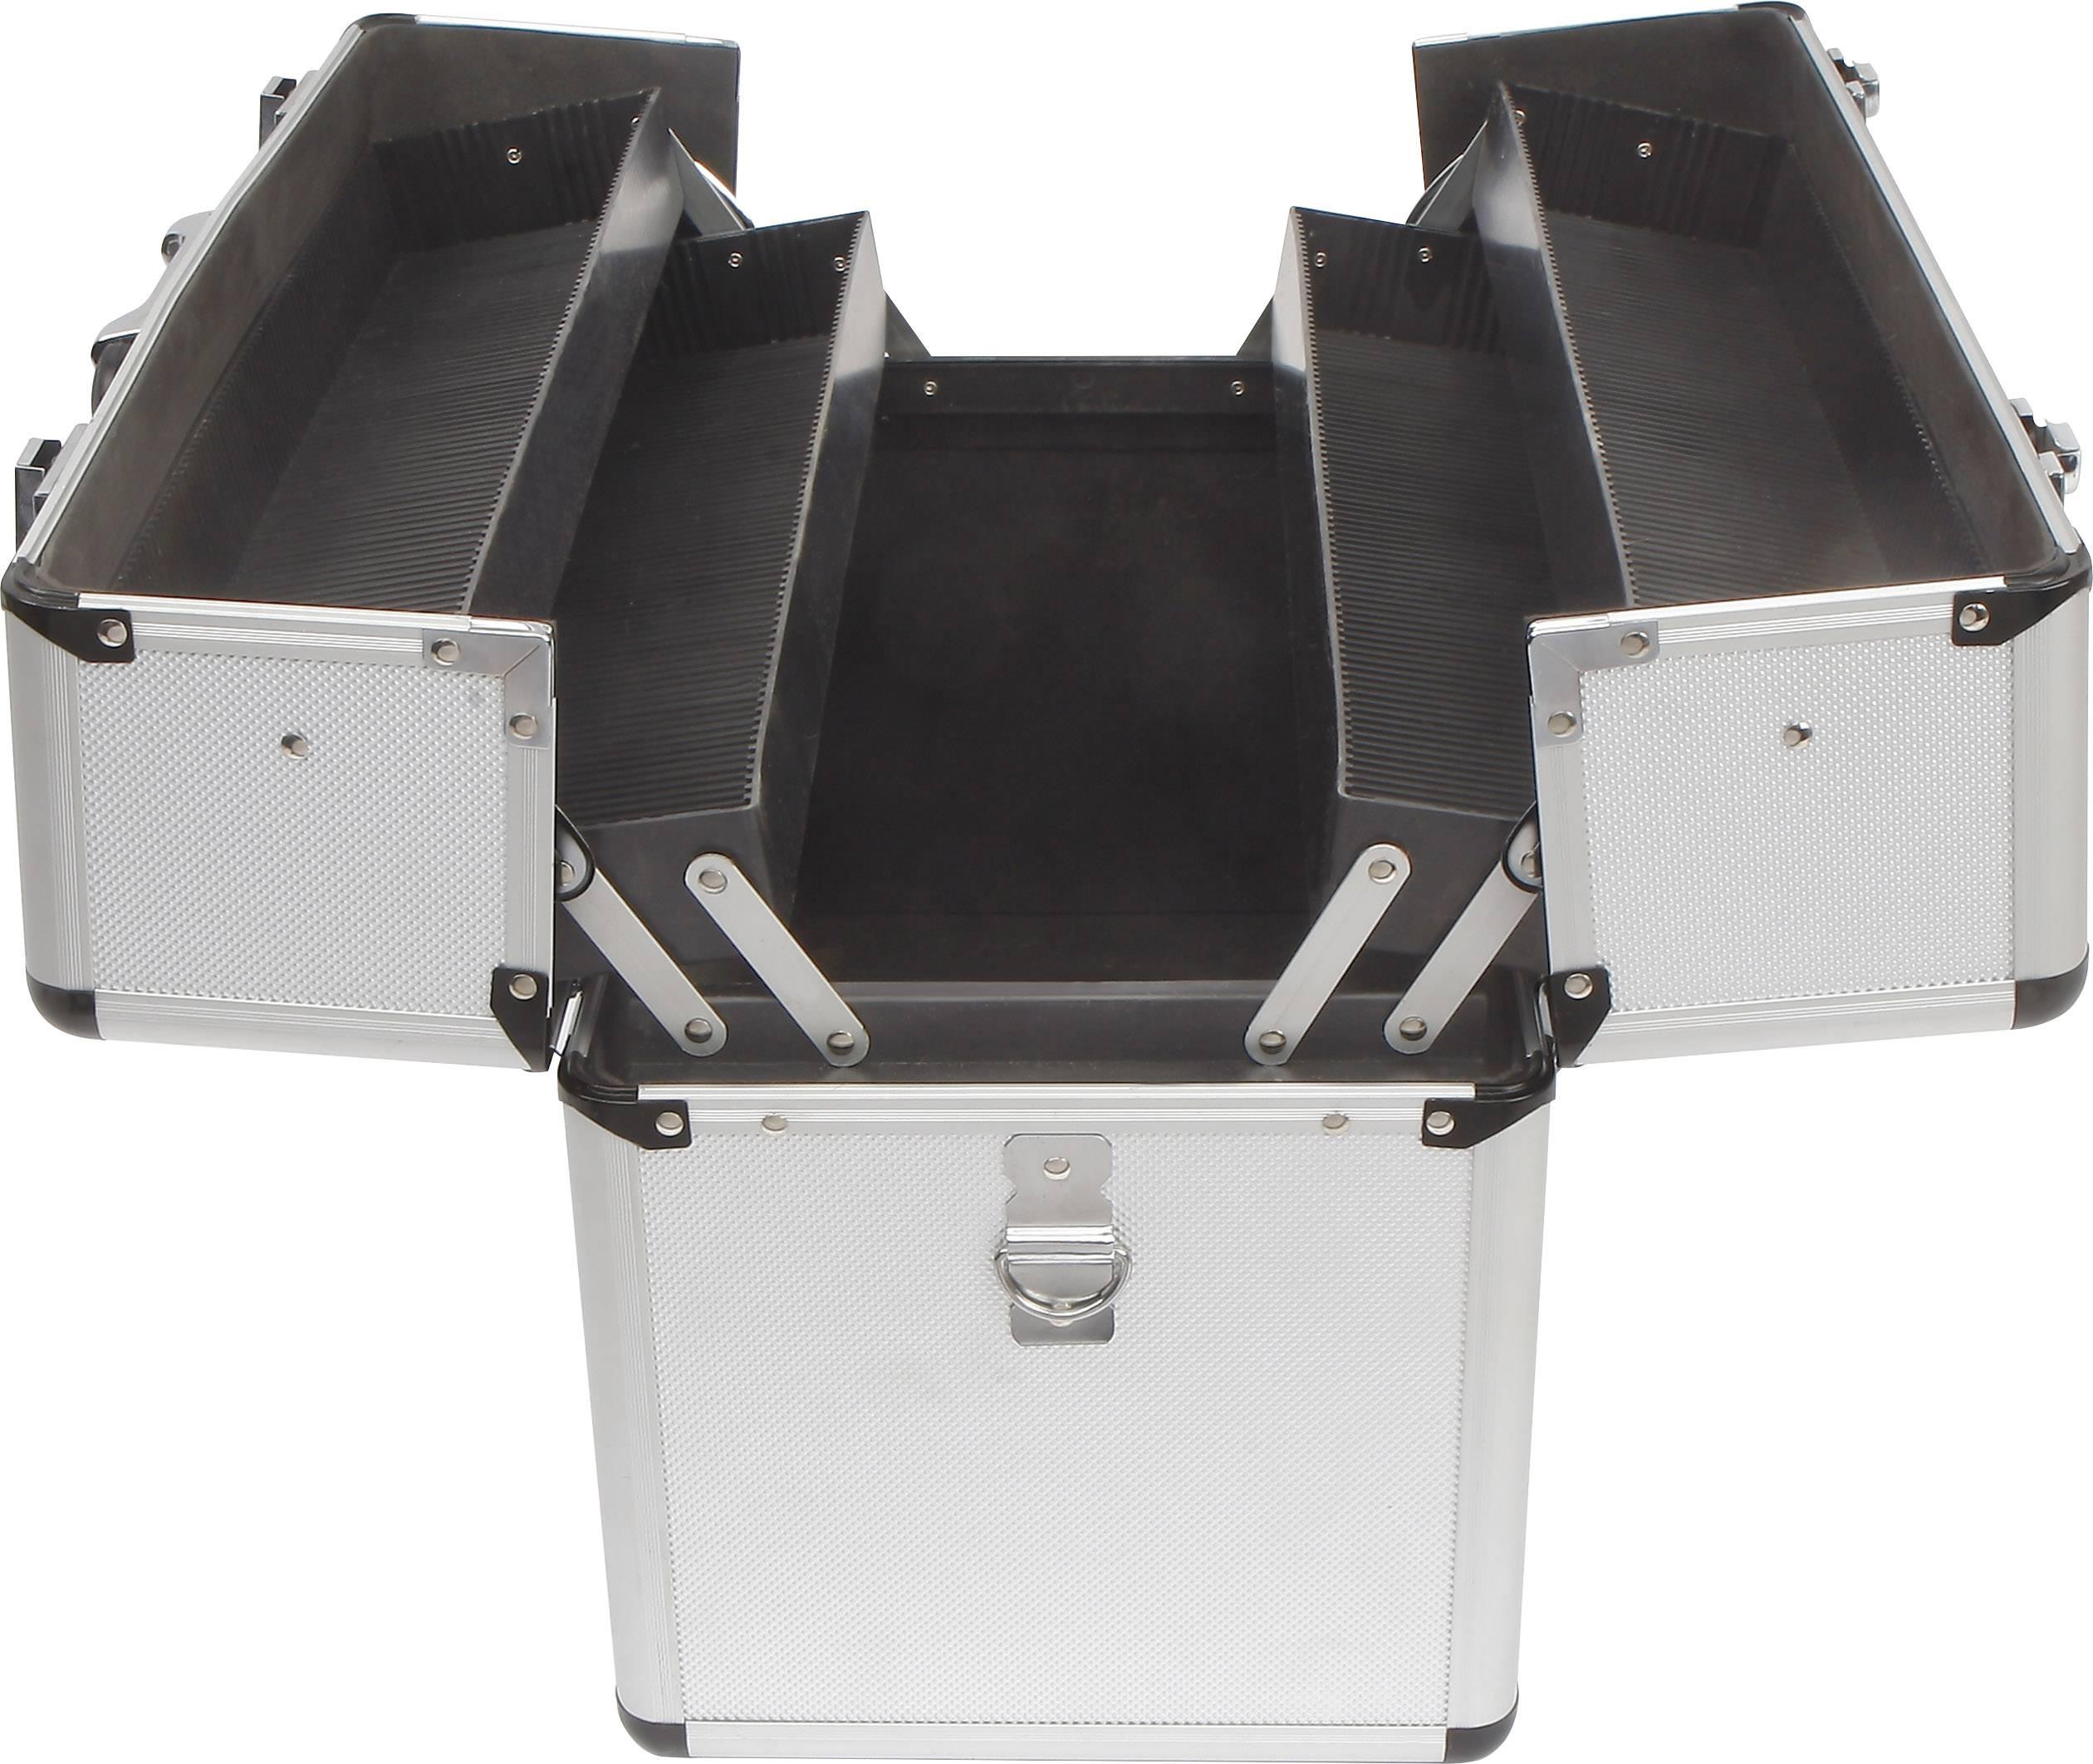 Pilotný kufor na náradie TOOLCRAFT 1409408, (š x v x h) 450 x 320 x 225 mm